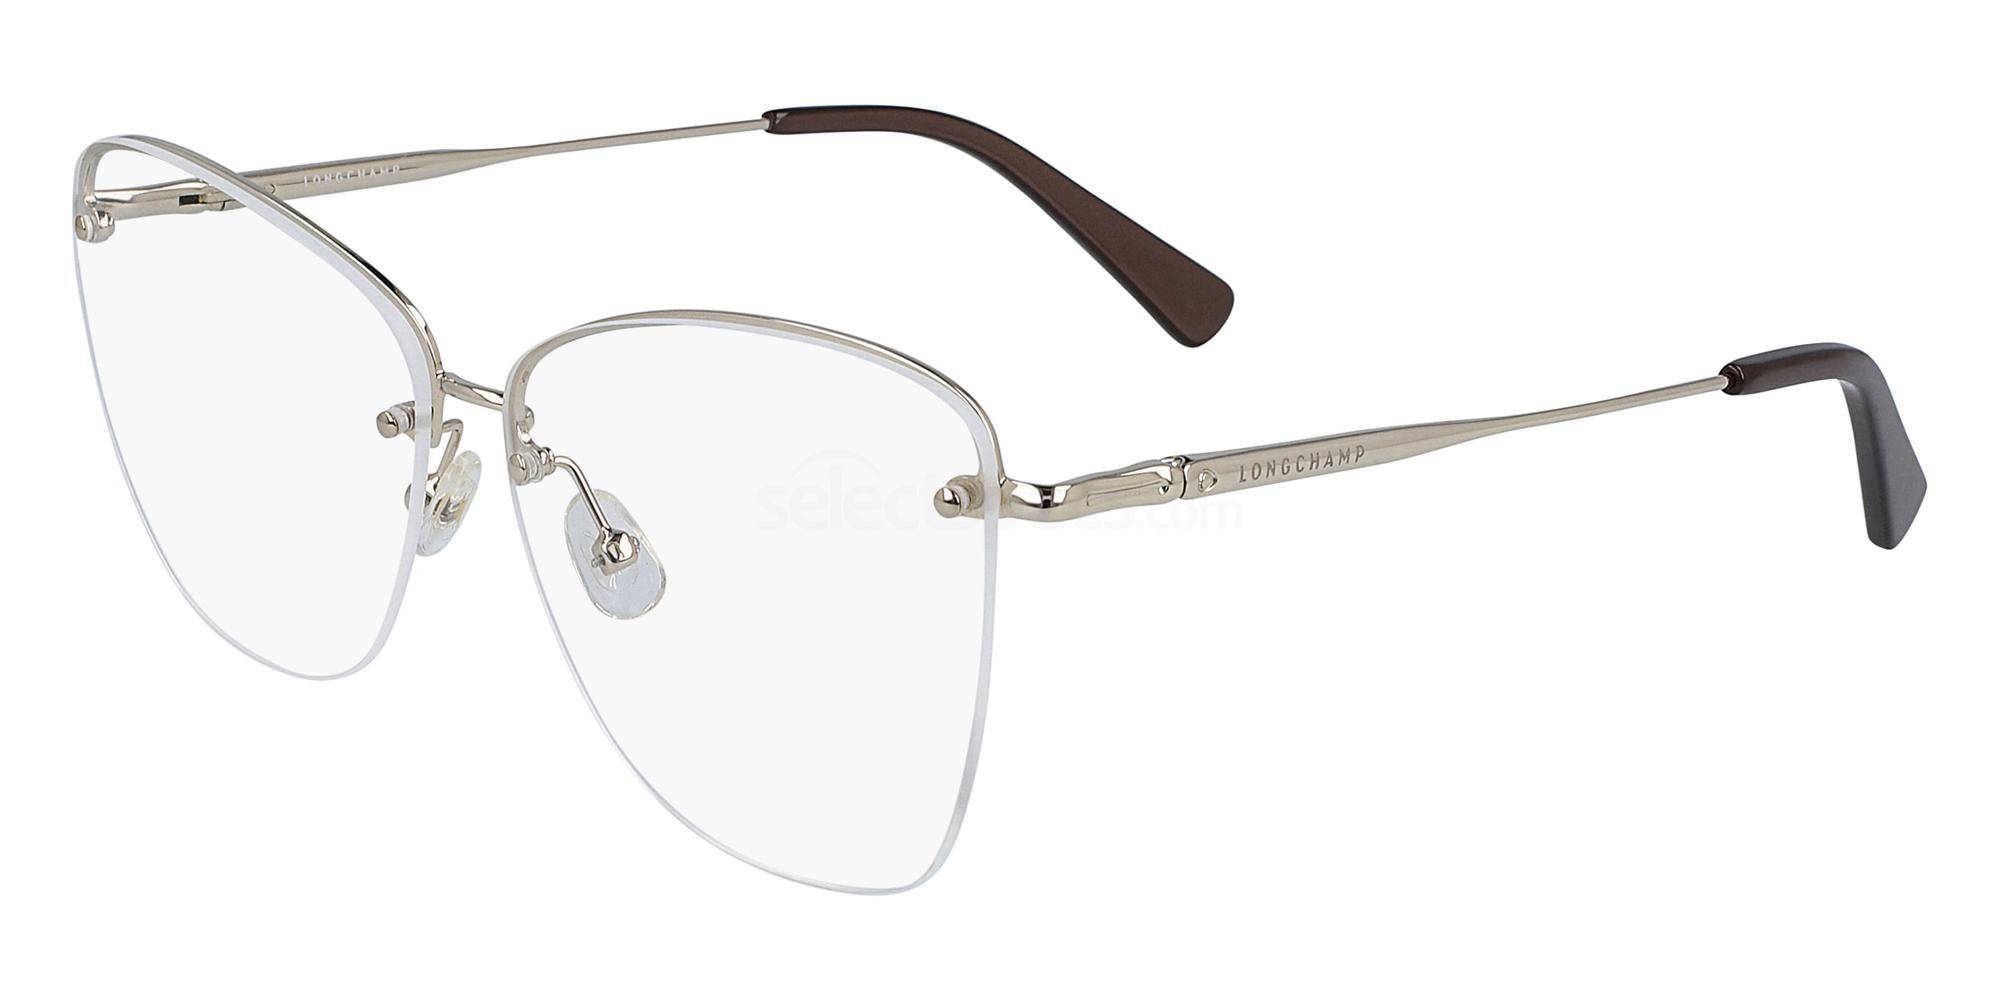 714 LO2116 Glasses, LONGCHAMP